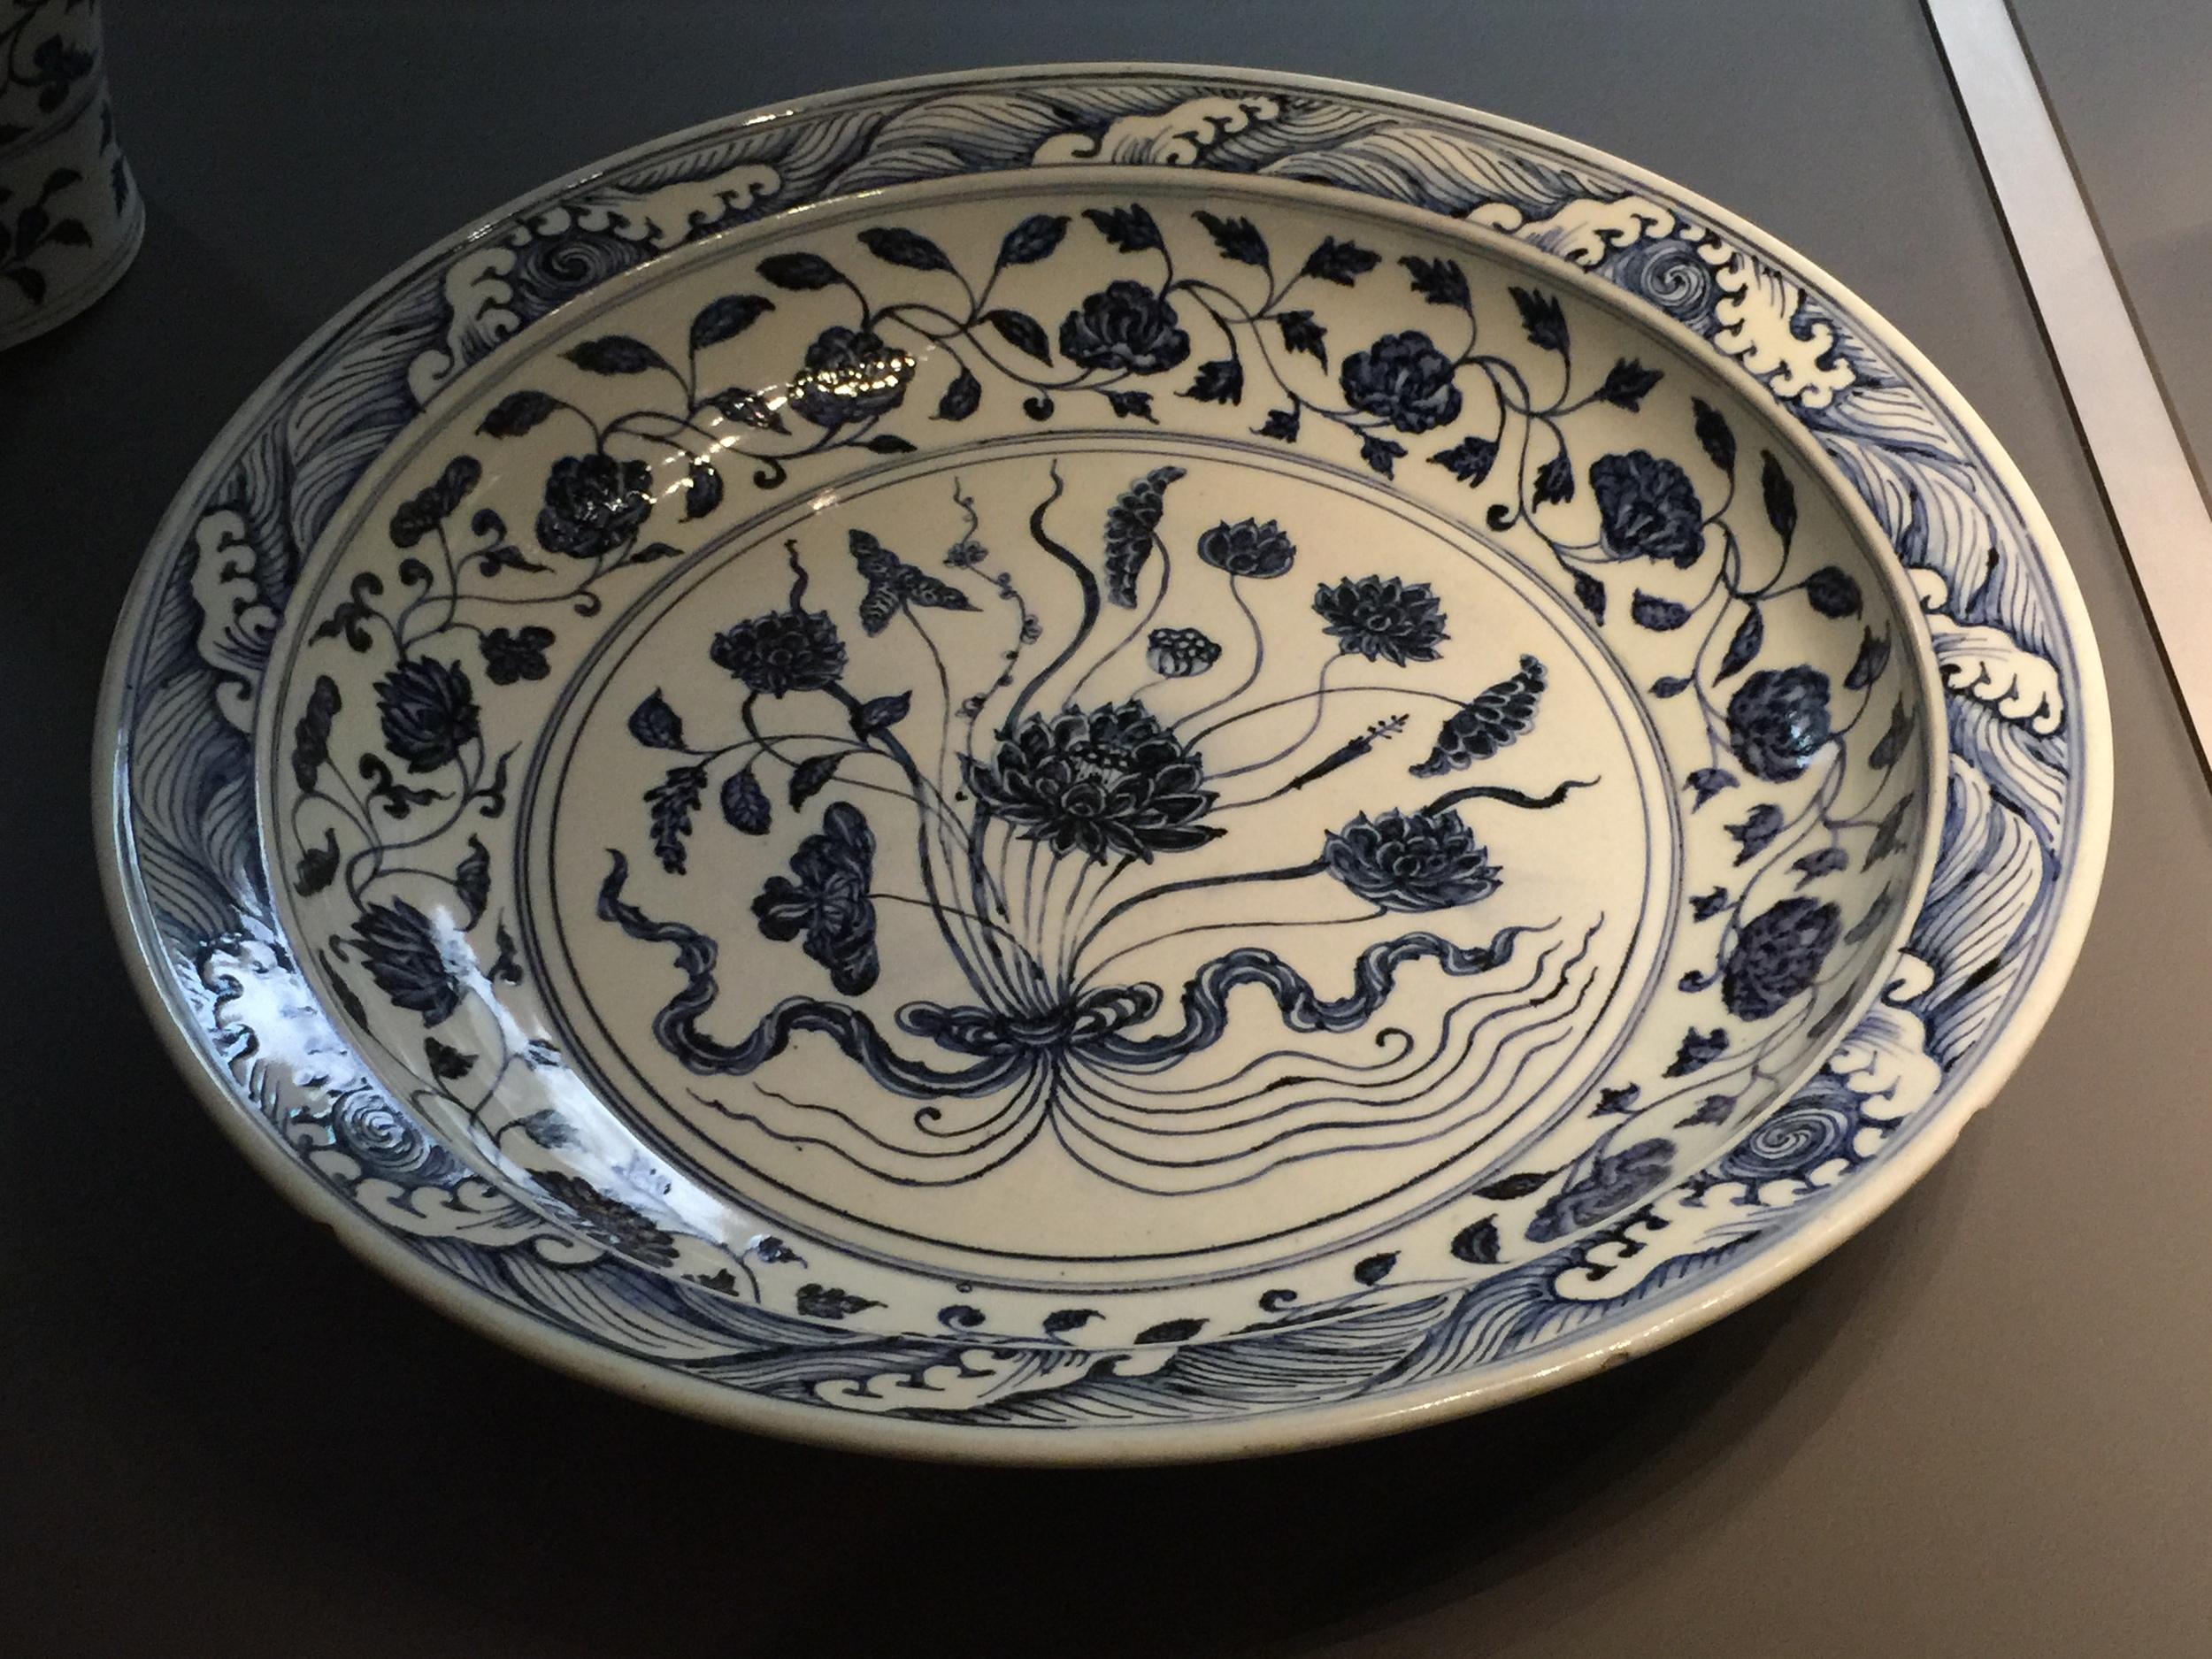 Chinese-Porcelain-British-Museum-Percival-David-jessewaugh.com-73.jpg